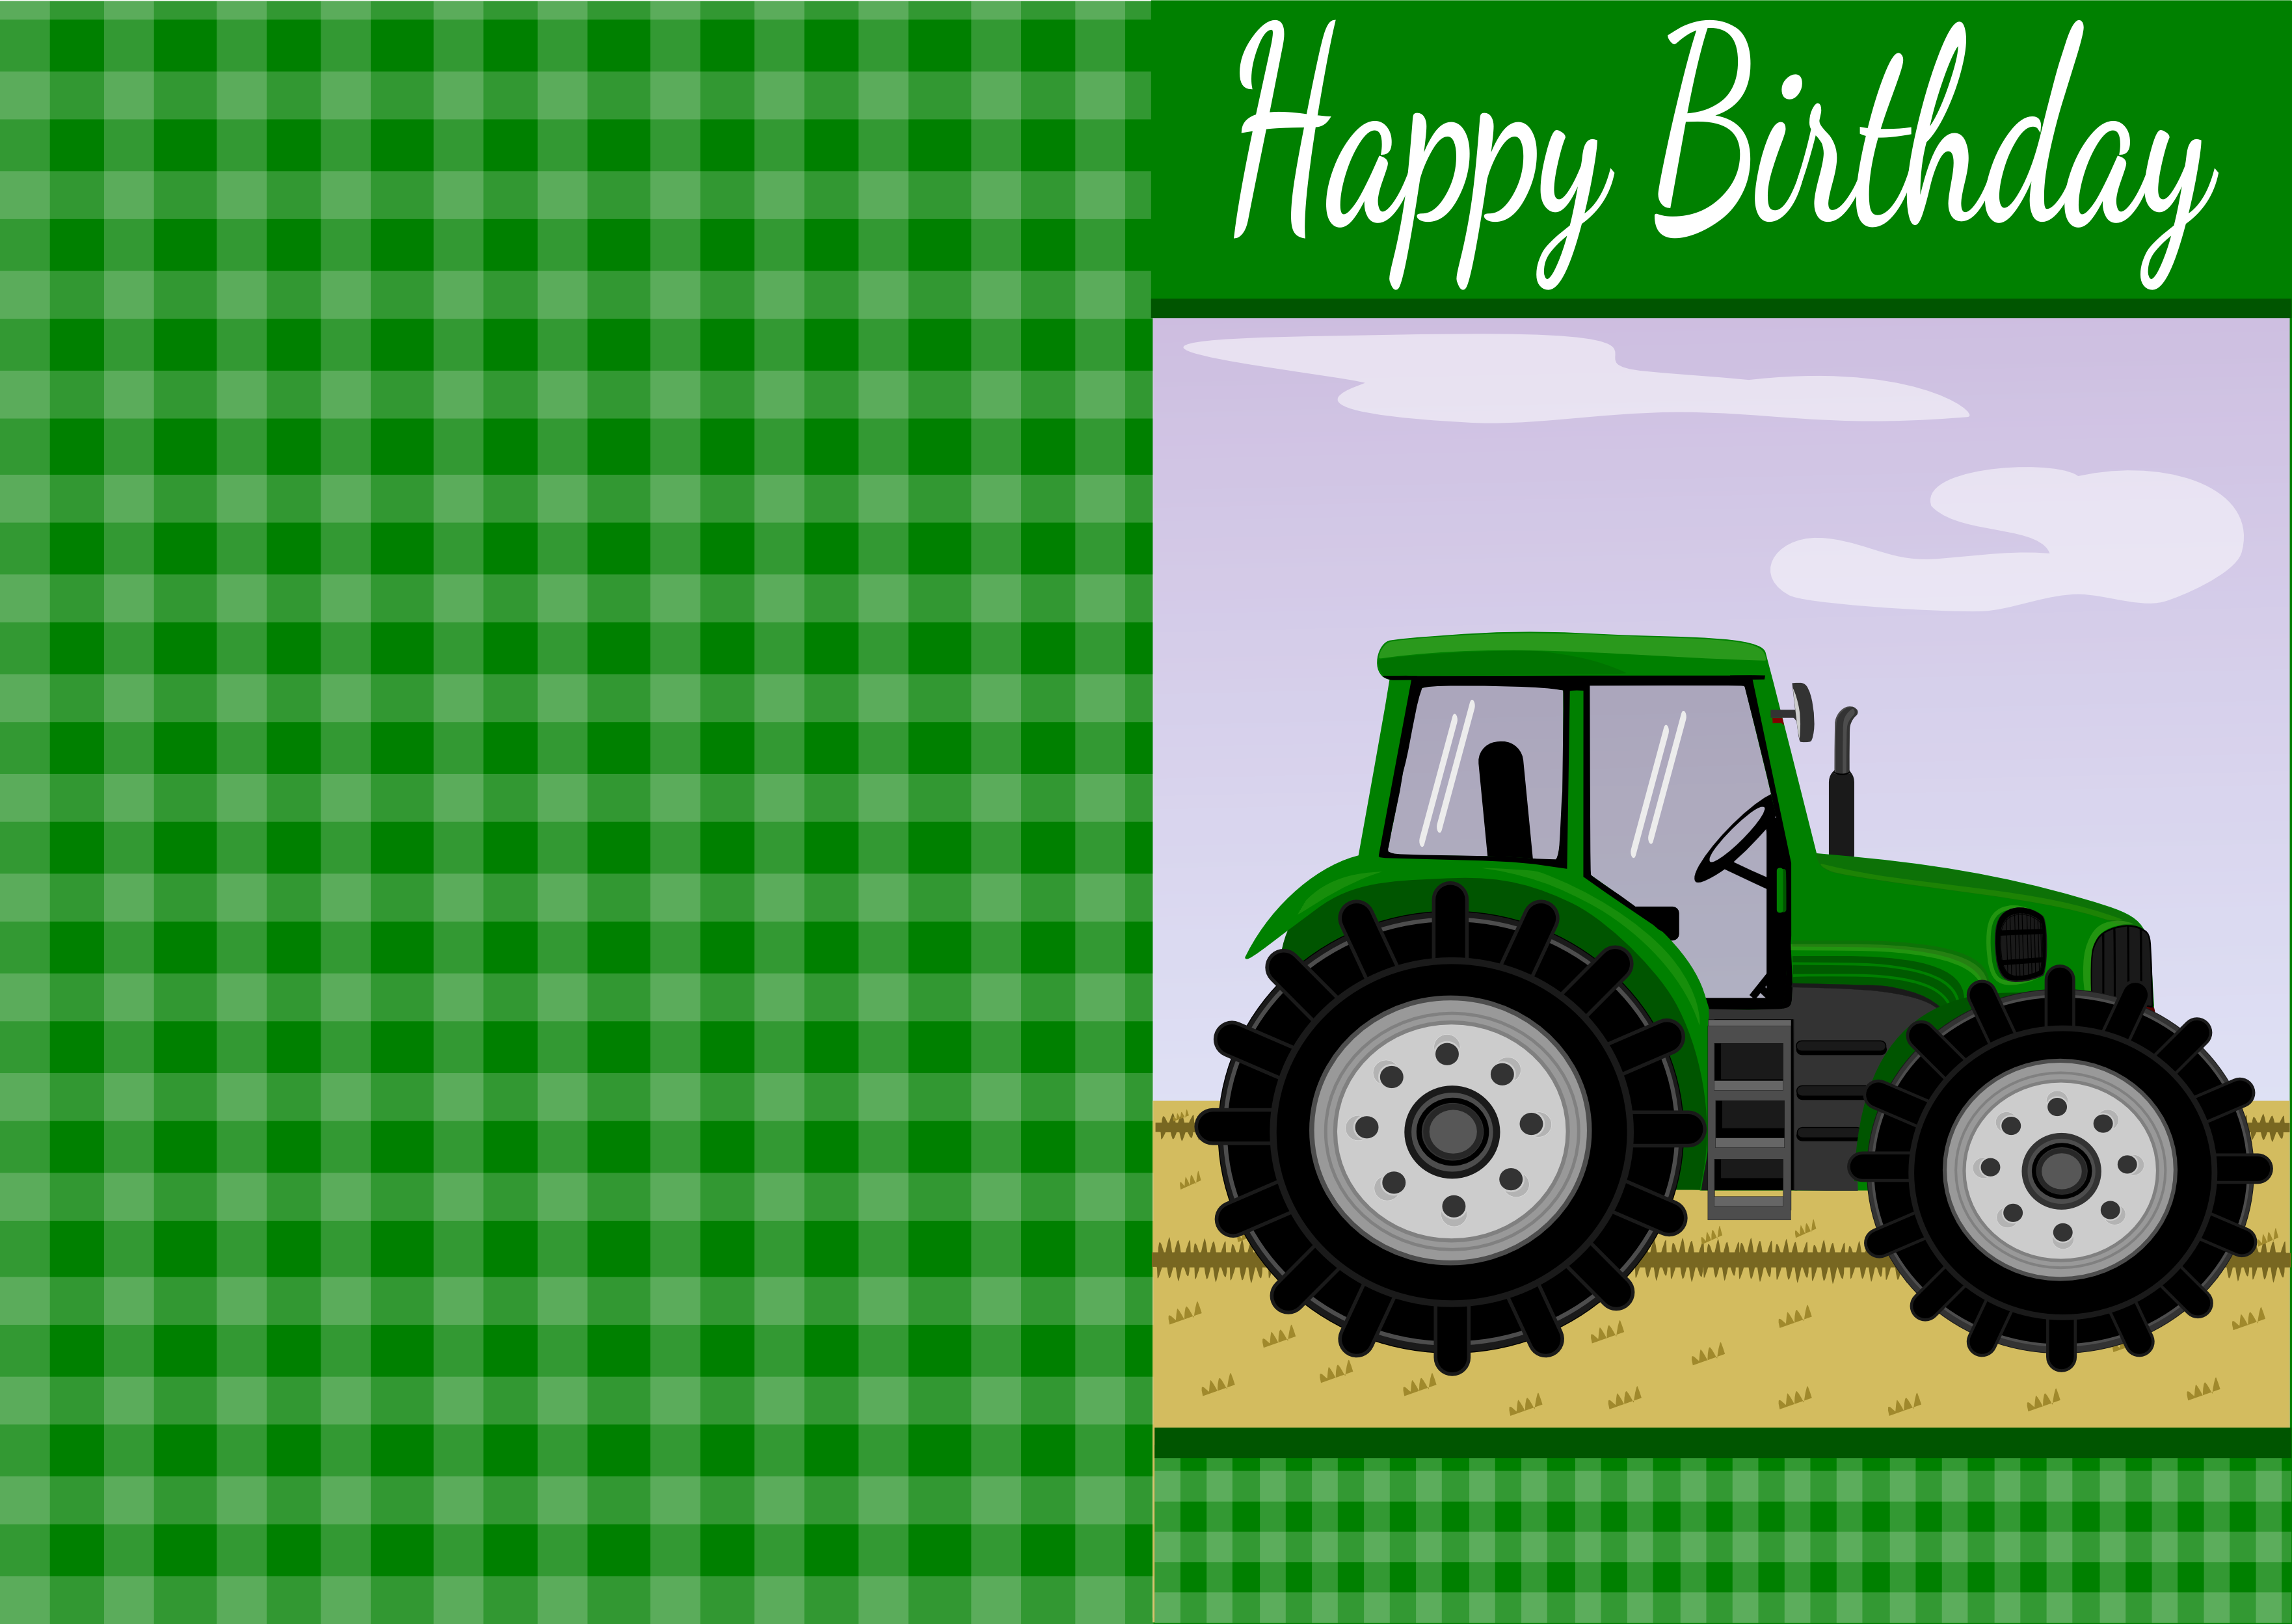 Printable Cards Birthday Cards For Boys Birthday Card Printable Funny Birthday Cards